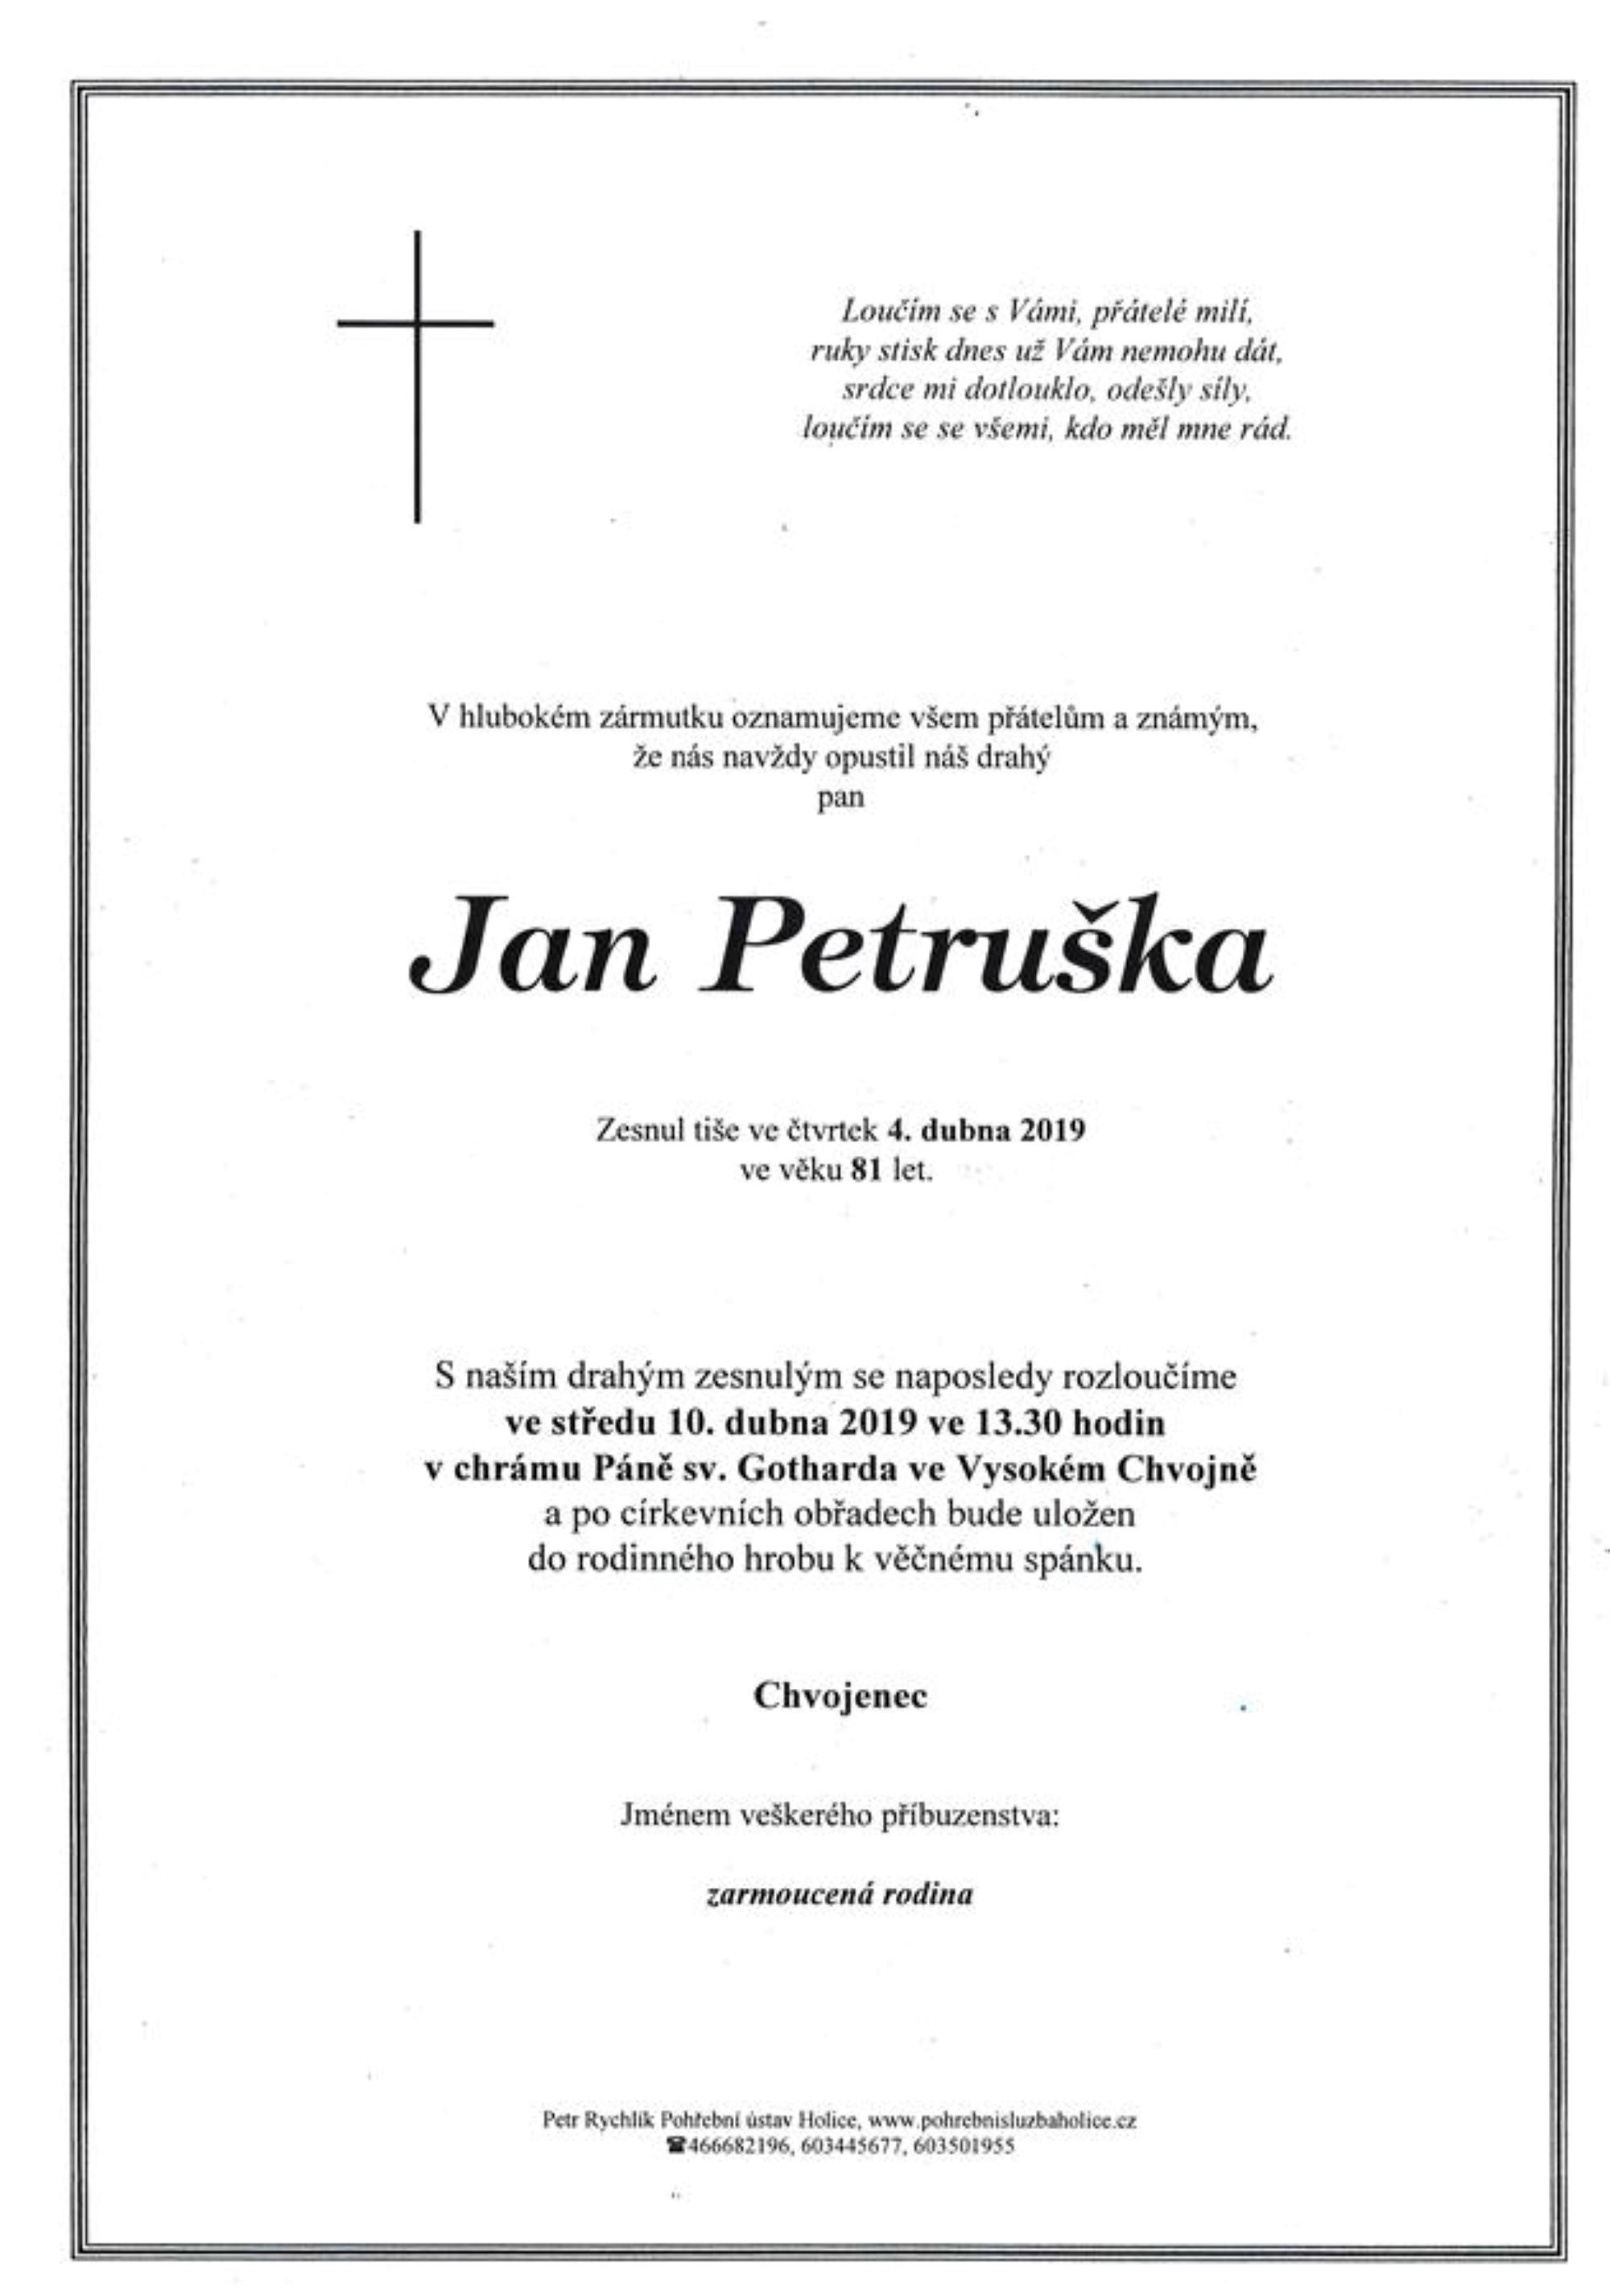 Jan Petruška